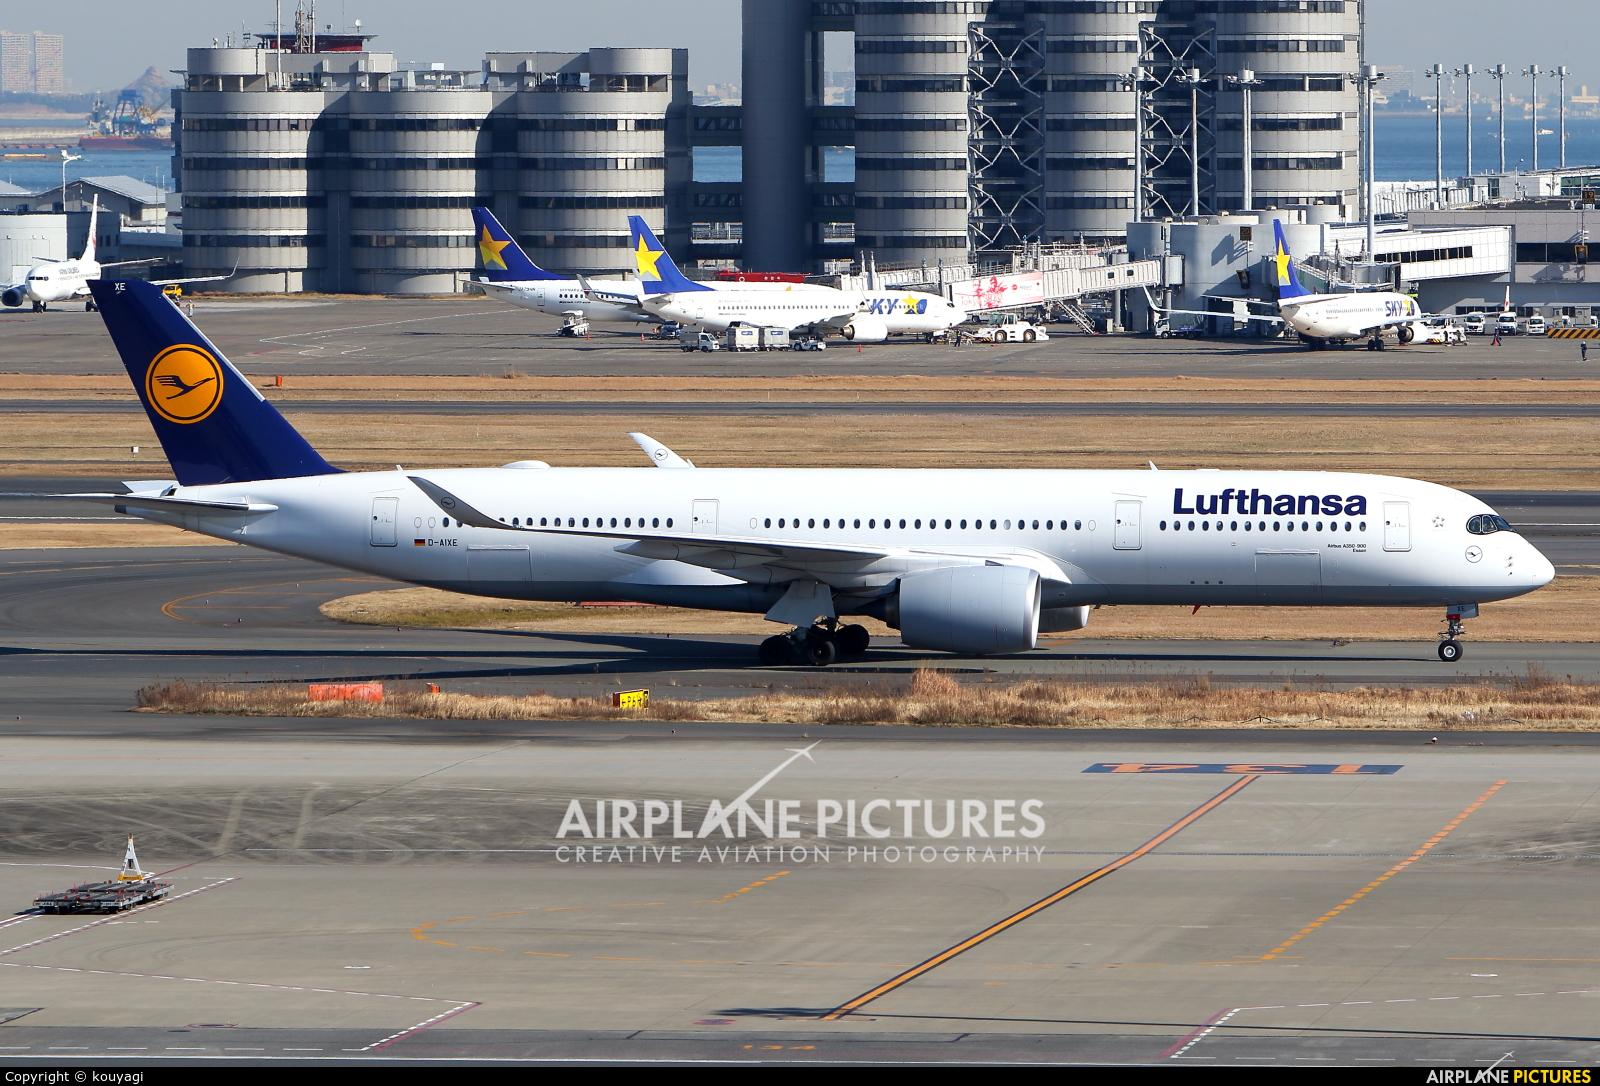 Lufthansa D-AIXE aircraft at Tokyo - Haneda Intl